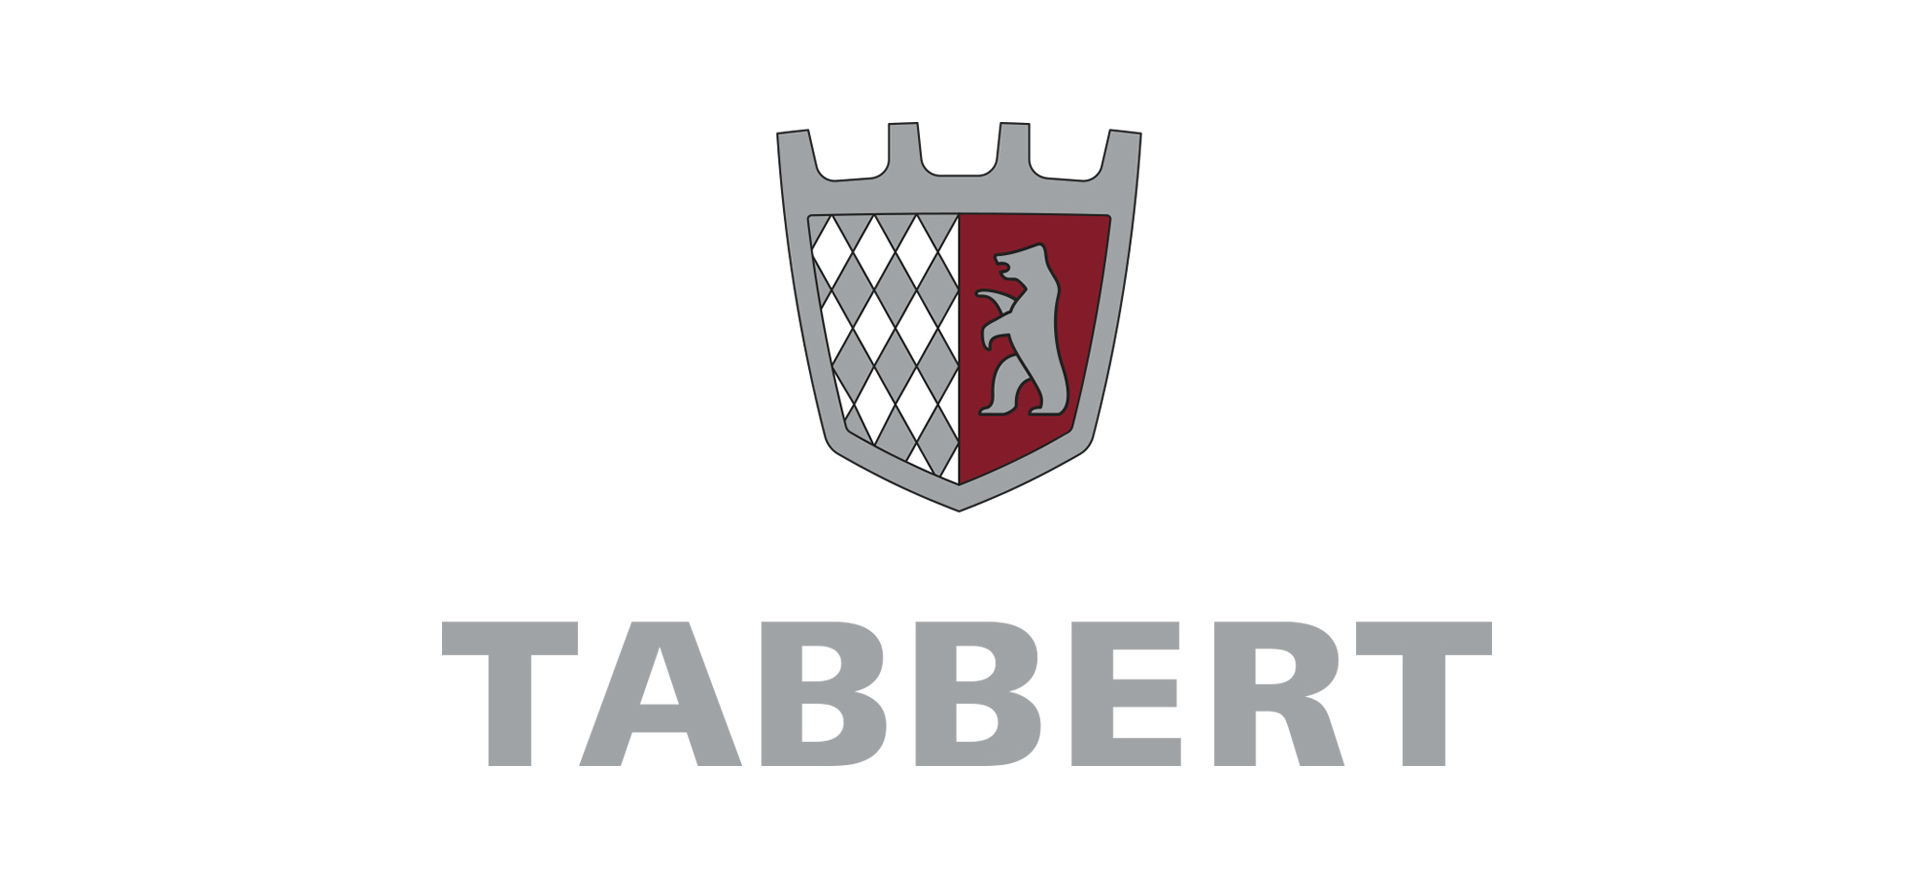 tabbert-logo-ohne-claim_vertikale_anordnung